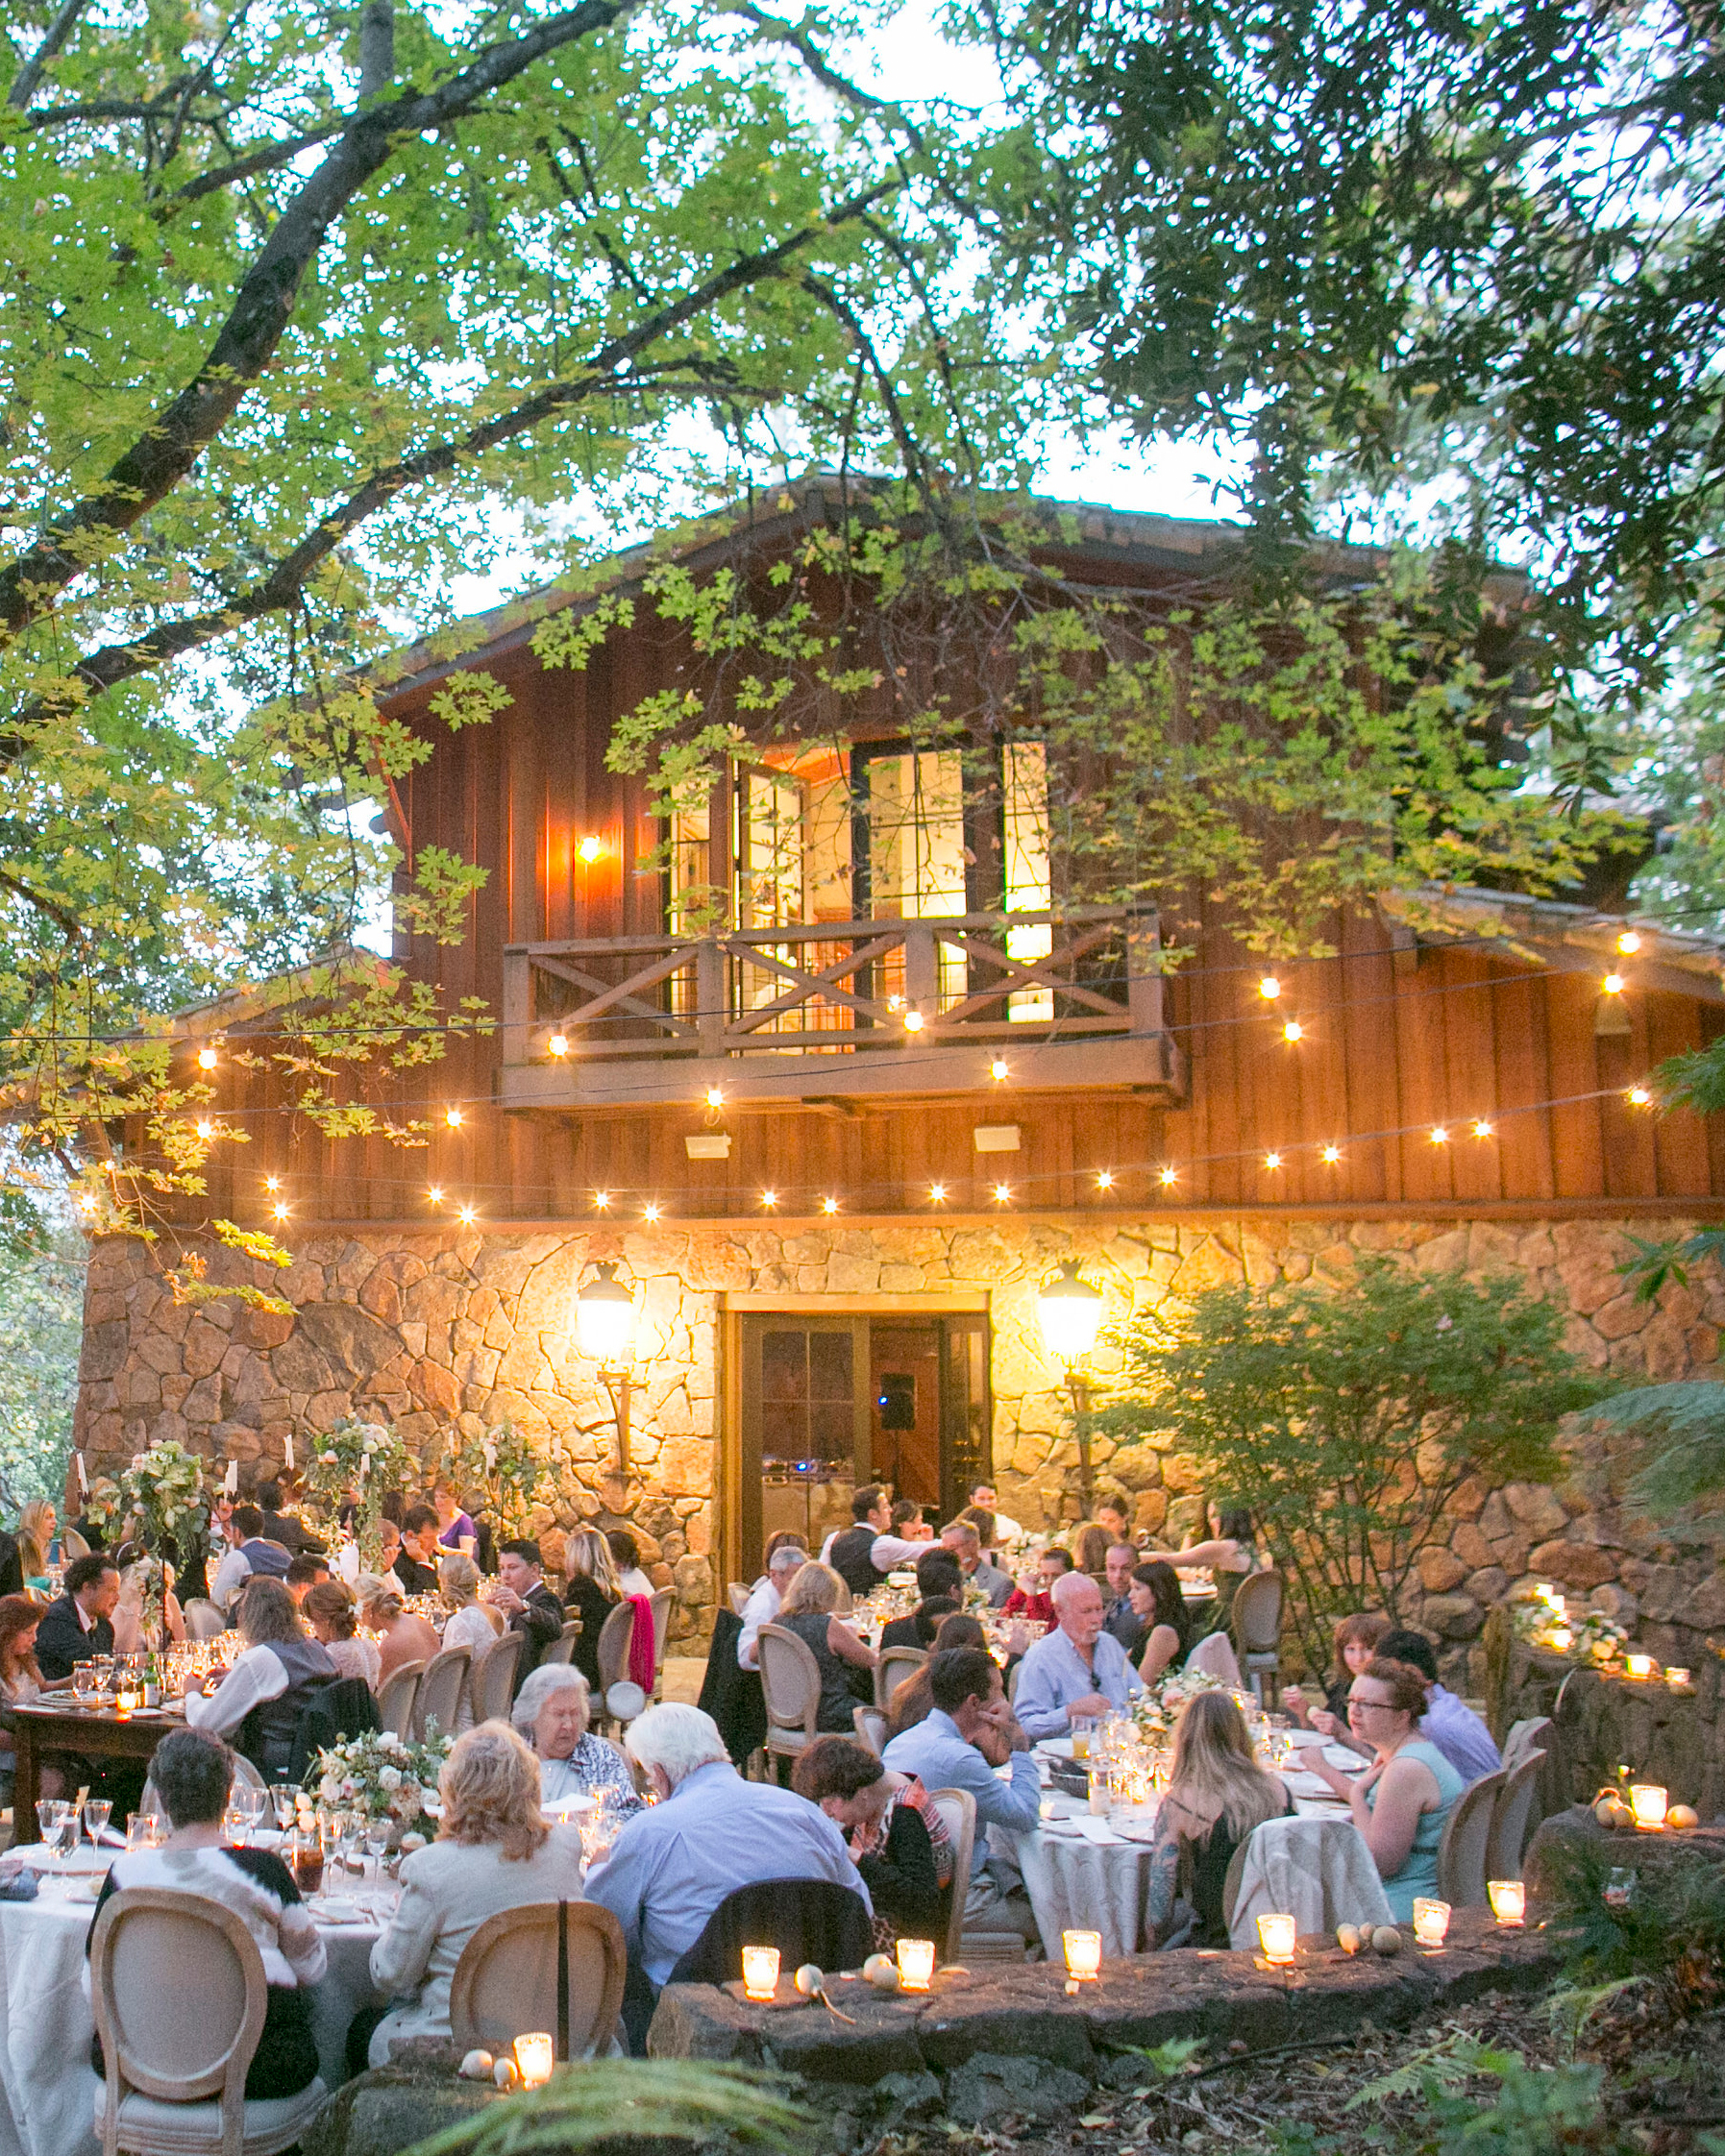 briana-adam-wedding-reception-1377-s112471-1215.jpg